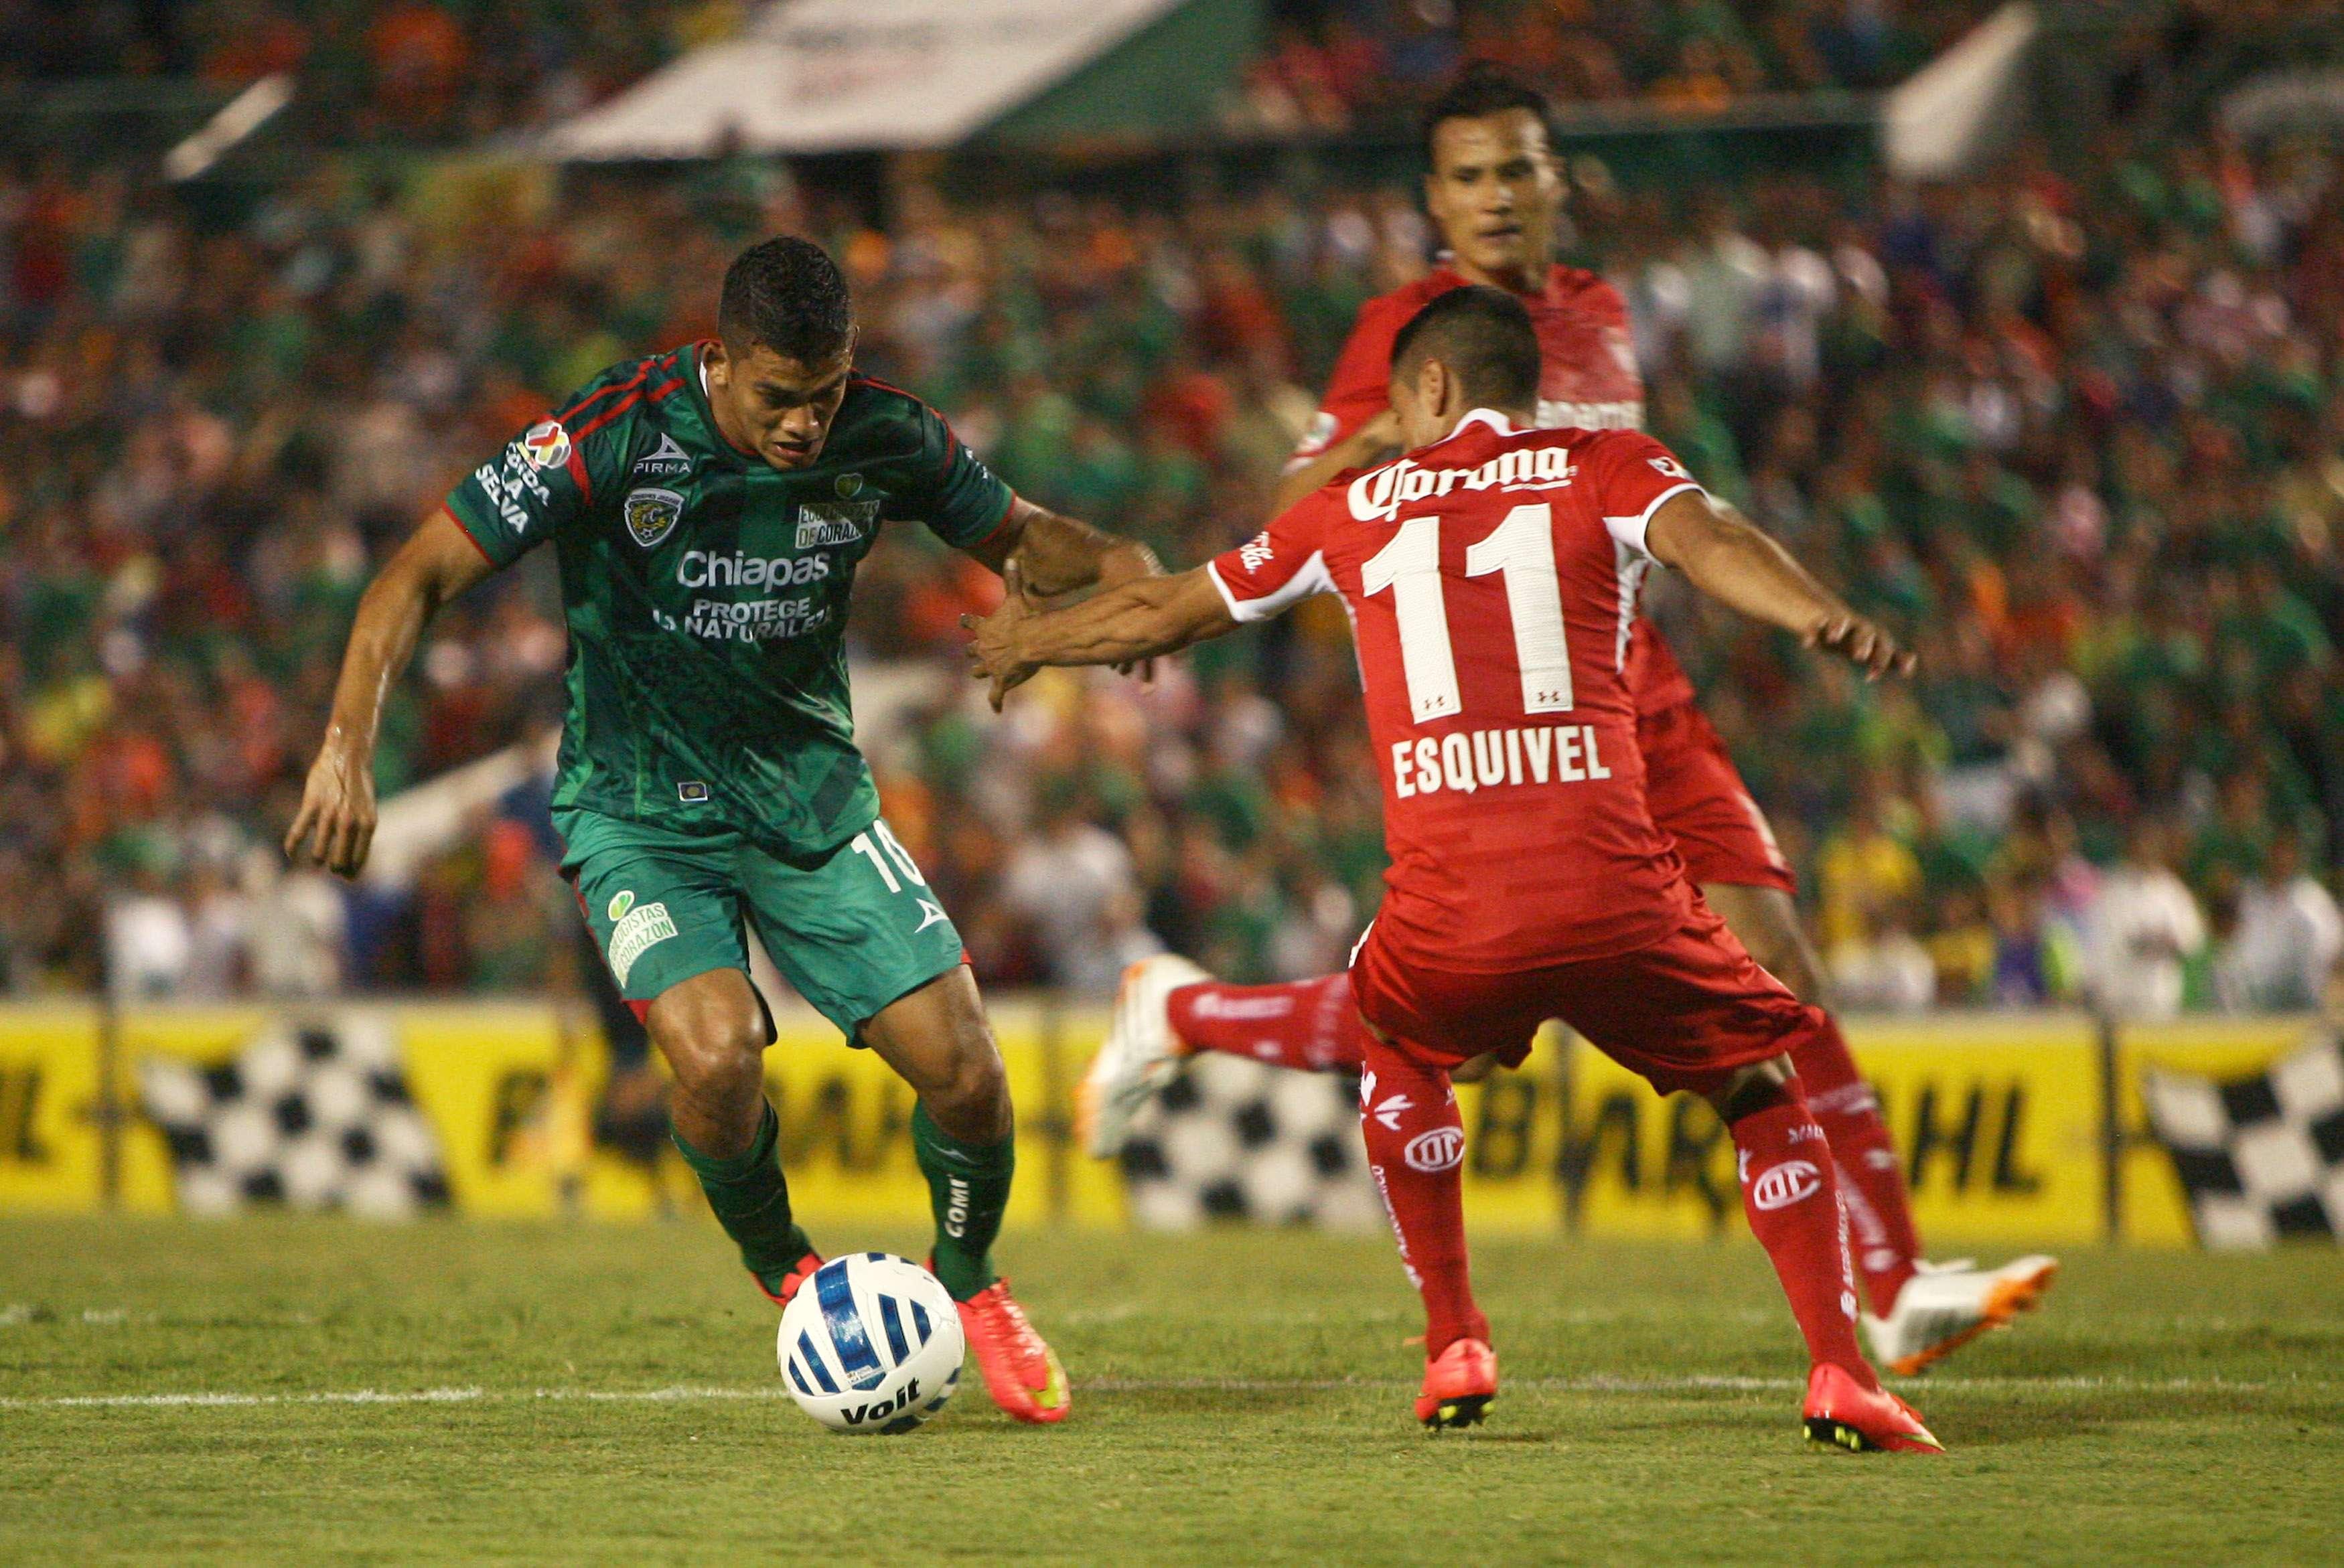 Jaguares puede sorprender a Toluca Foto: Mexsport